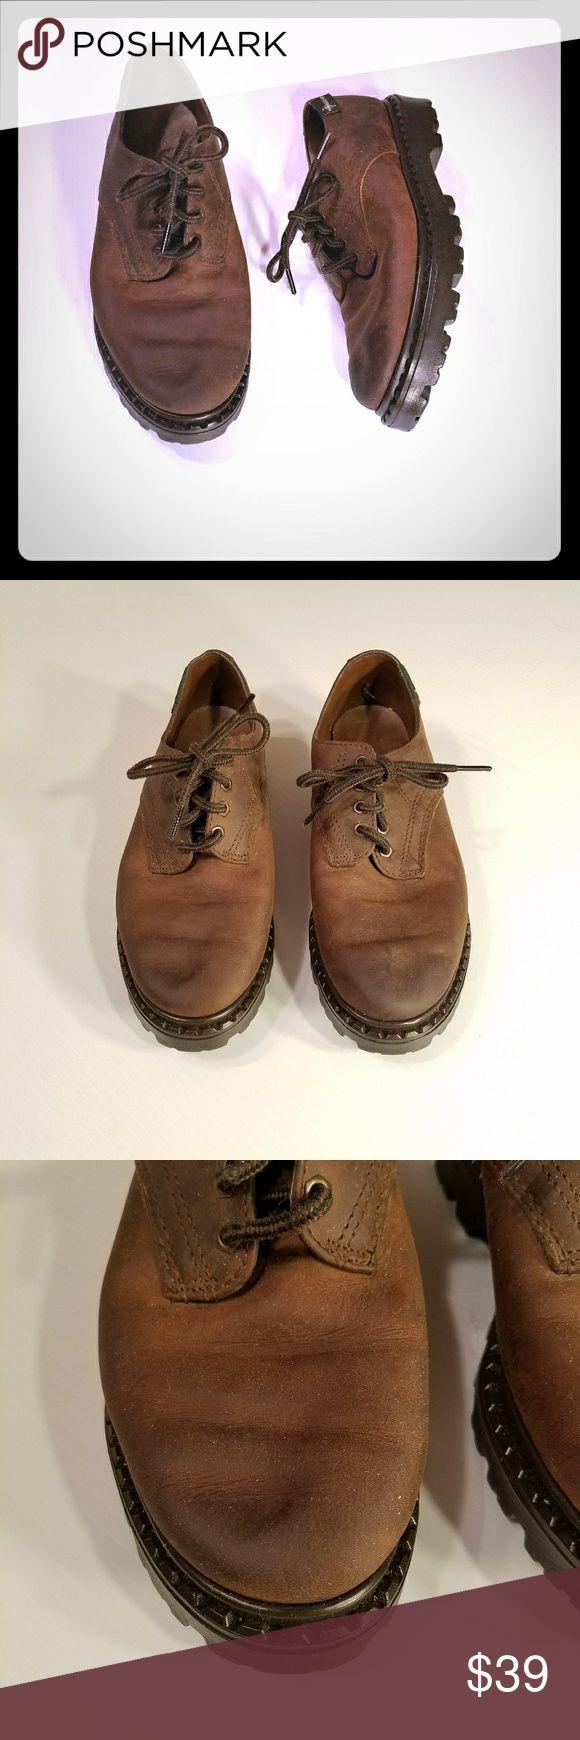 Vintage Eastland Leather Oxfords Lug Soles Sz 7M Vintage Eastland Oxfords Shoes Dark Brown Leather Lace Up Lug Soles Womens Sz 7M  Size 7M  See all pics for details Eastland Shoes Flats & Loafers